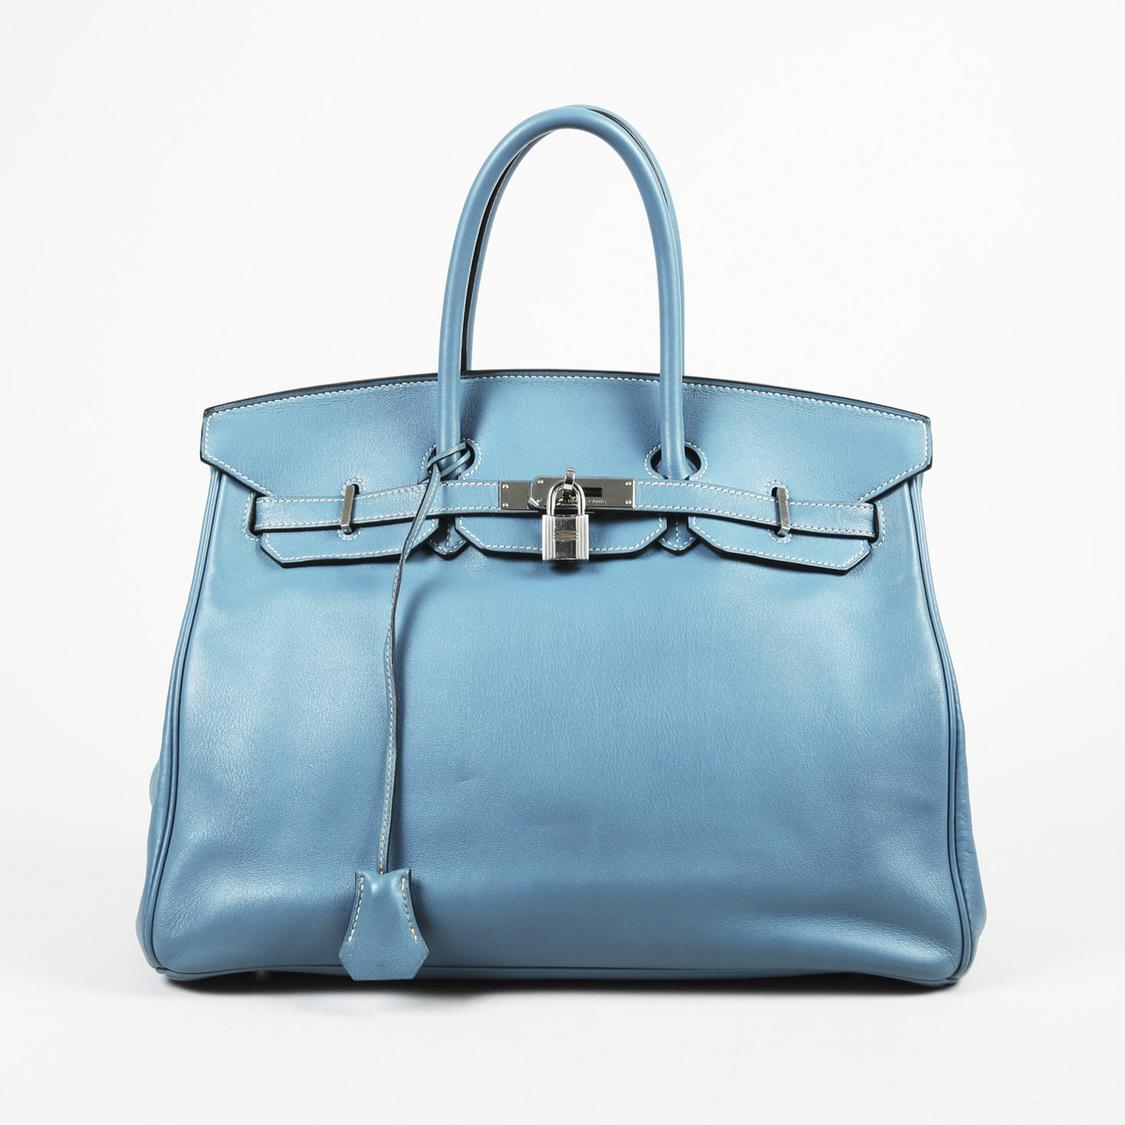 315ef9b77215 Lyst - Hermès Blue Jean Swift Leather